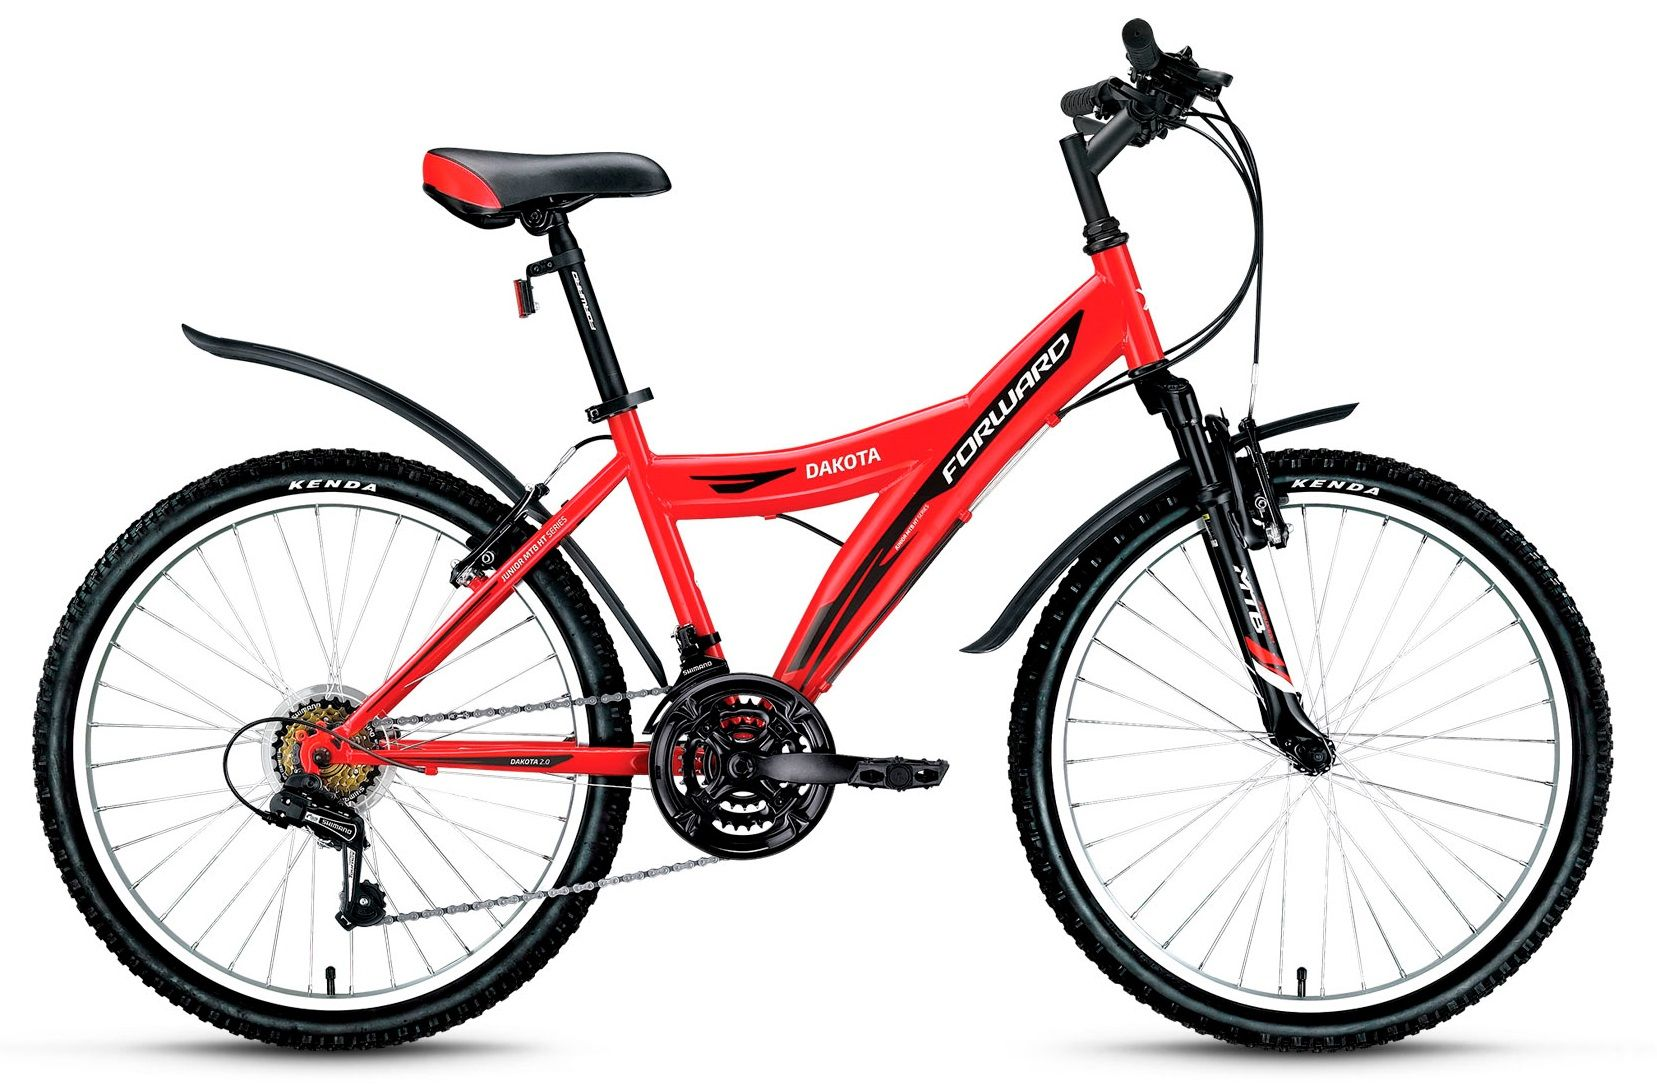 Велосипед Forward Dakota 24 2.0 2016 велосипед forward terra 1 0 2016 18 navy white